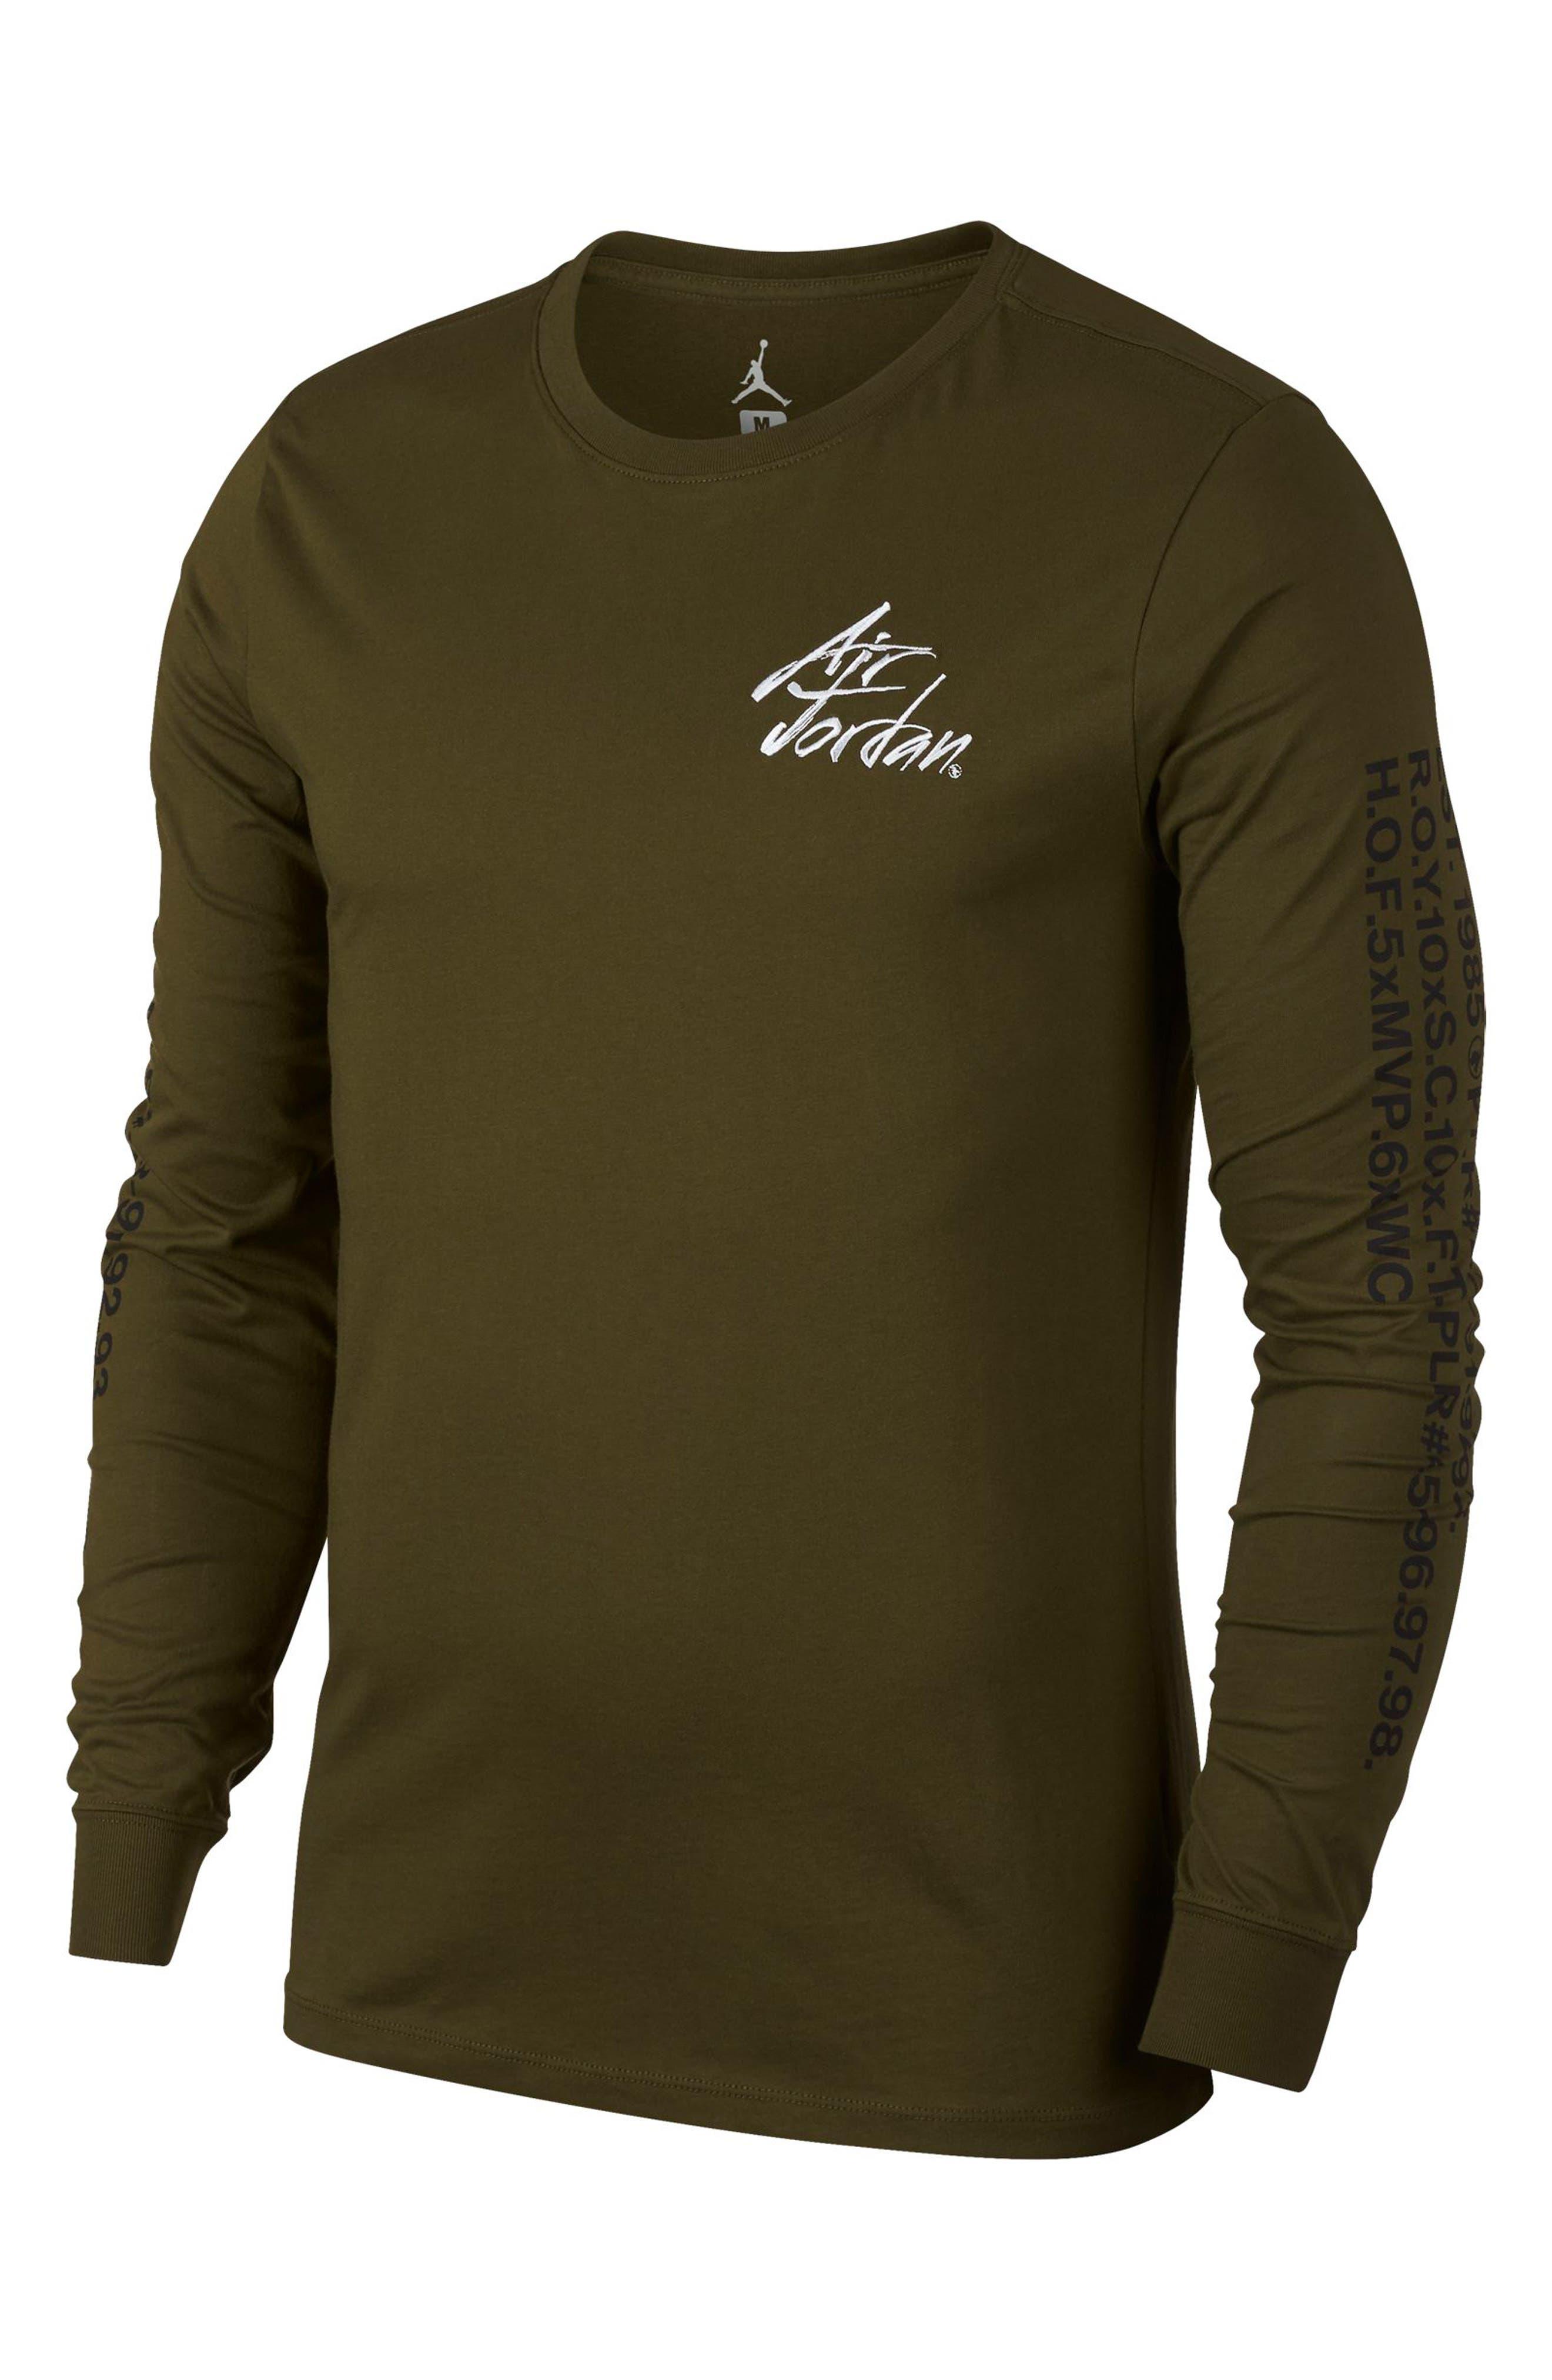 Nike Jordan Jsw Greatest Graphic T-Shirt Green